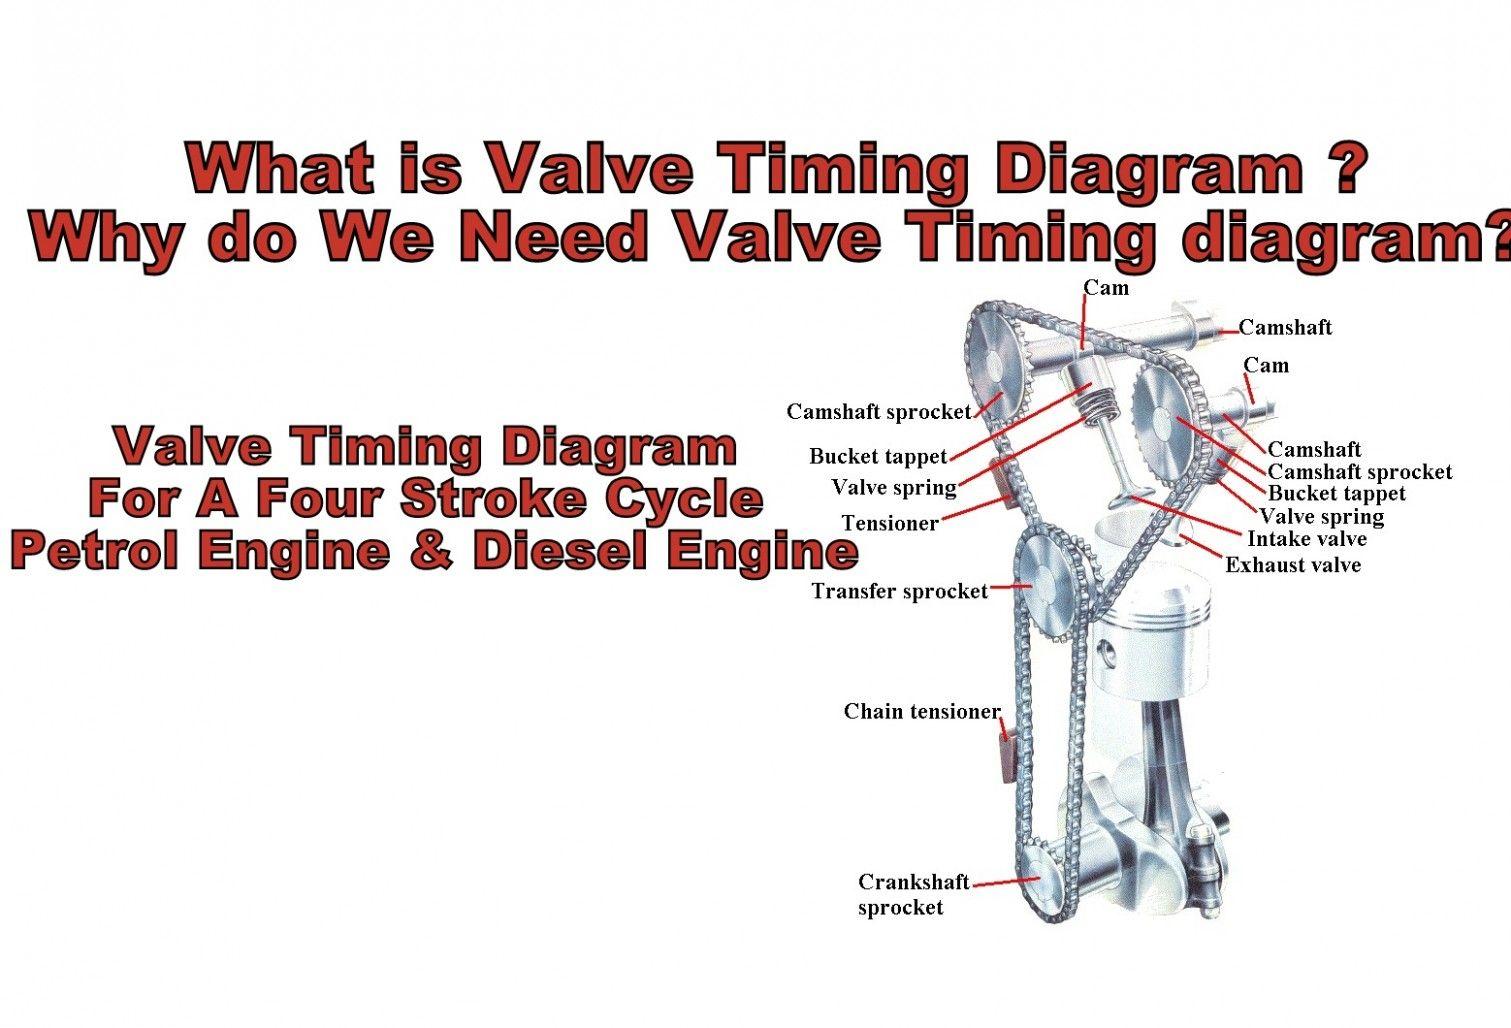 Engine Timing Diagram Questions Worksheet